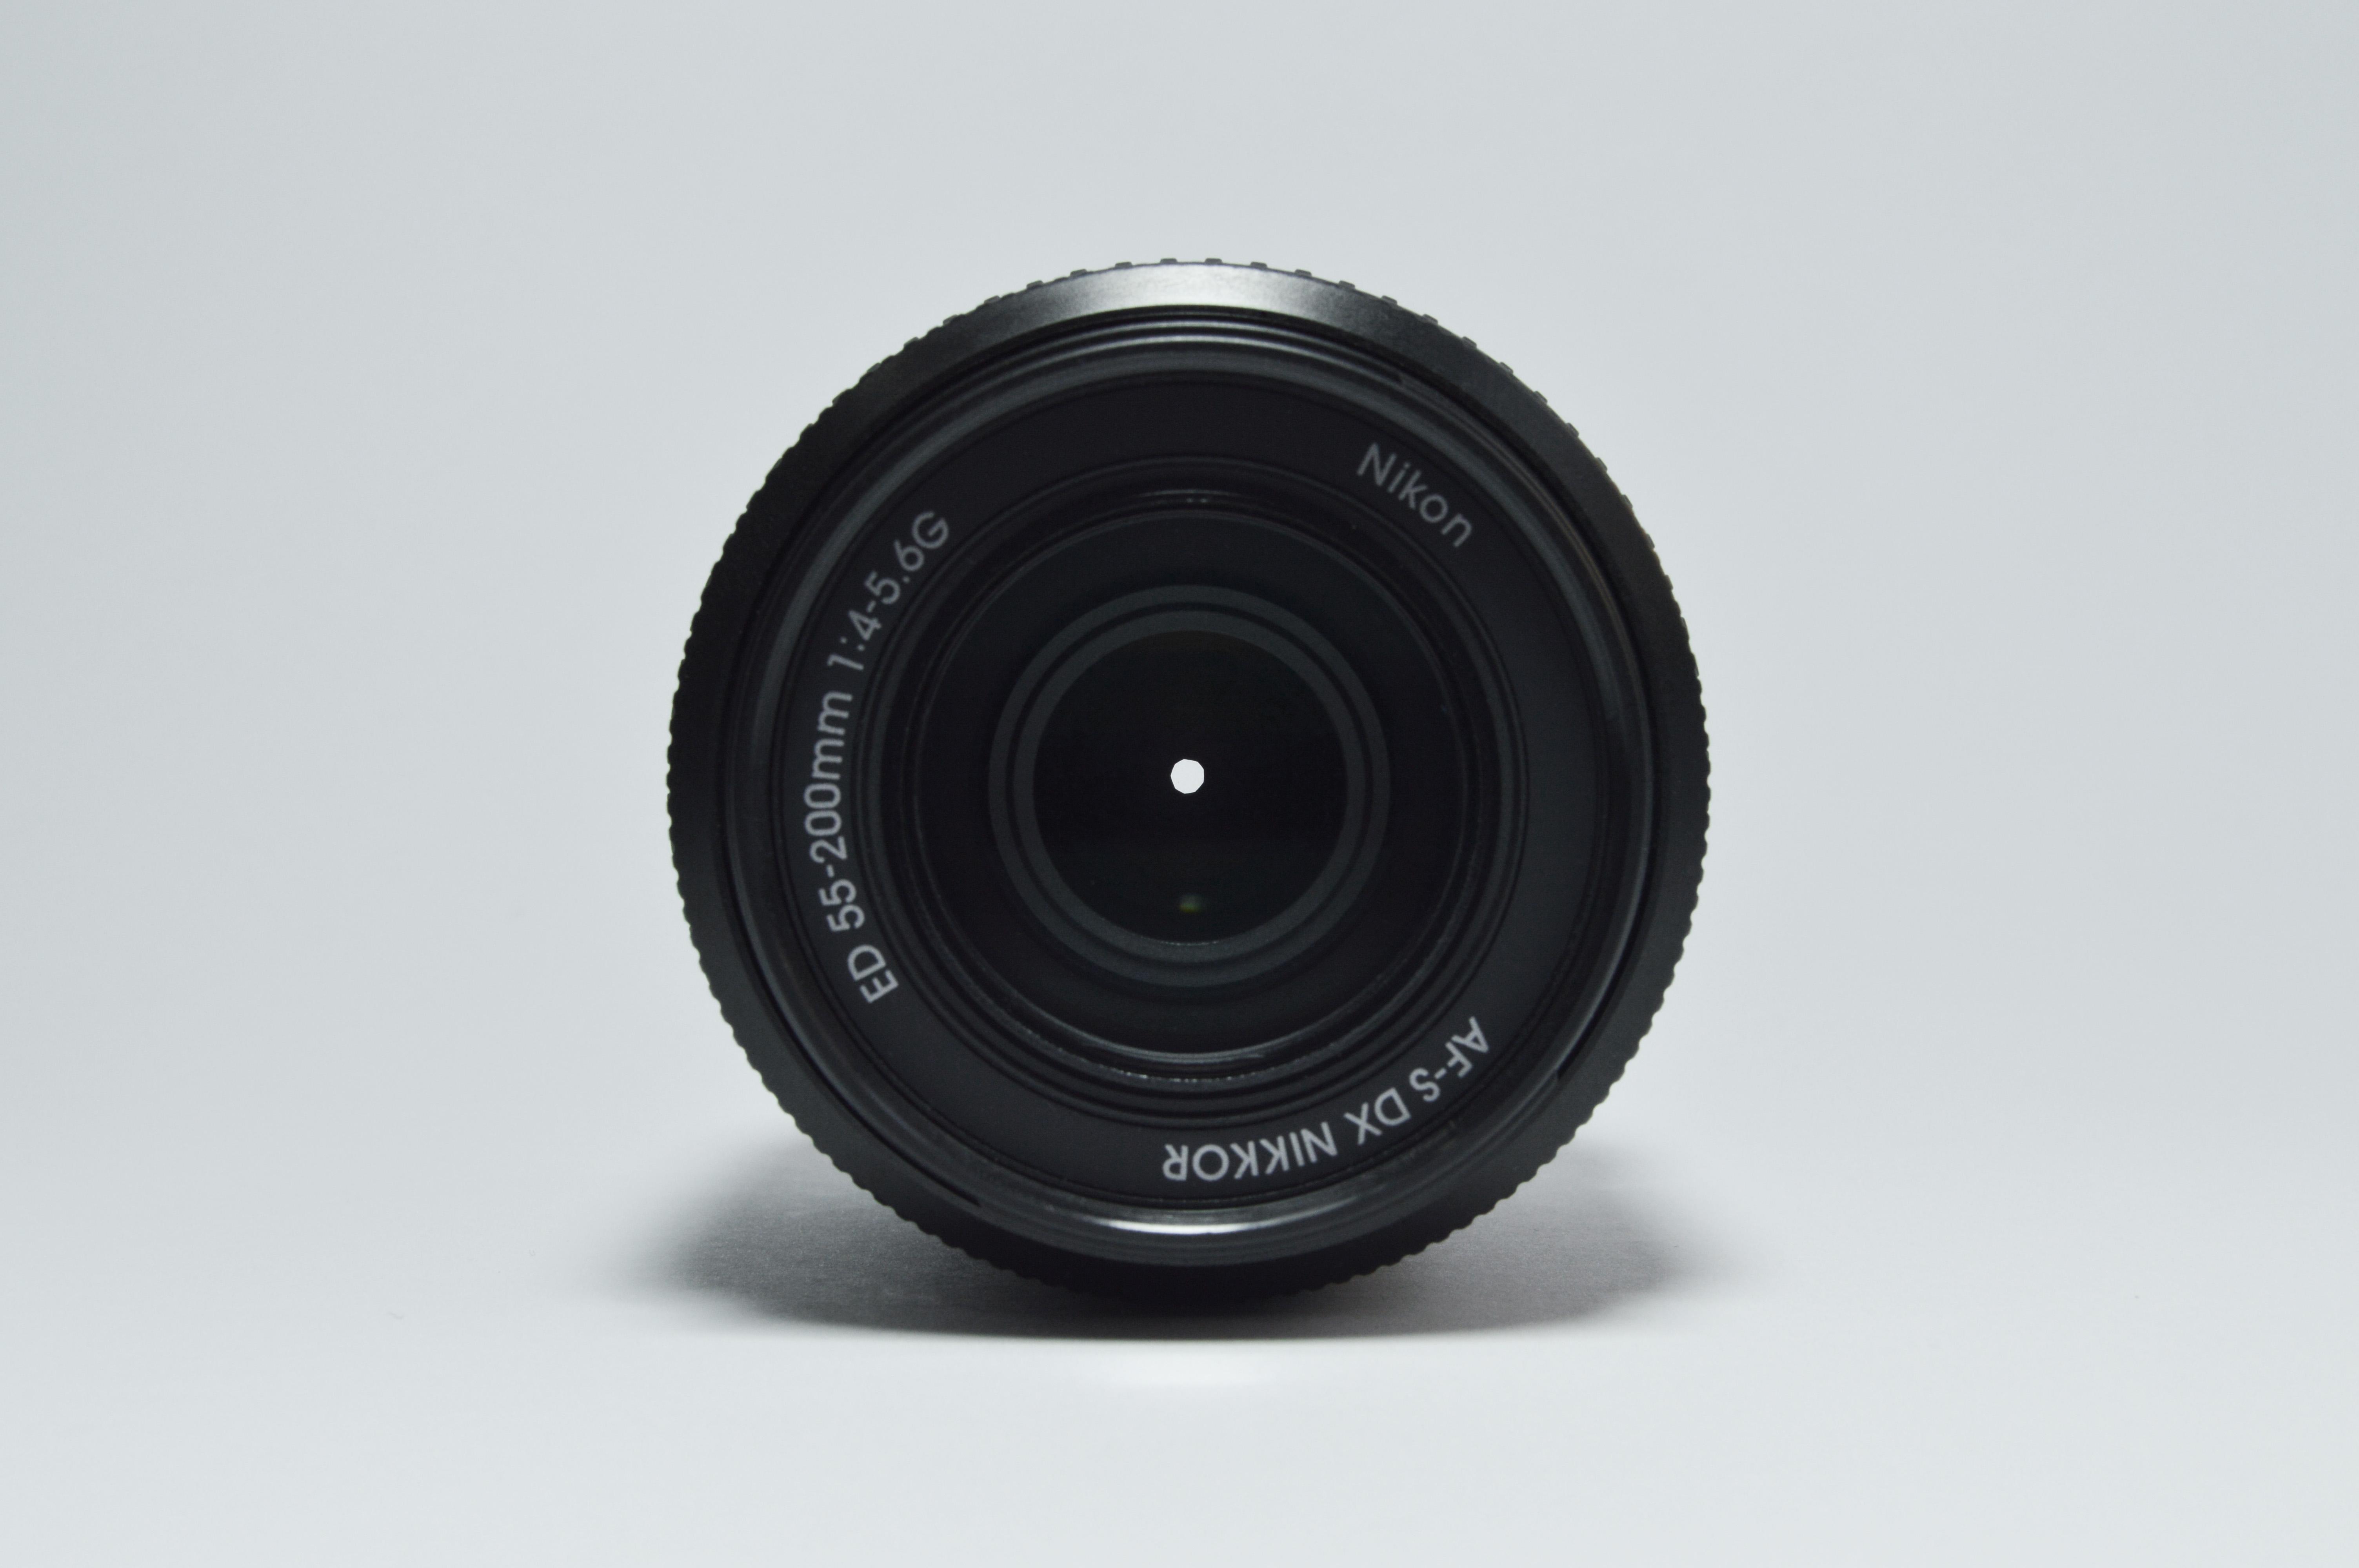 Free stock photo of camera, equipment, lens